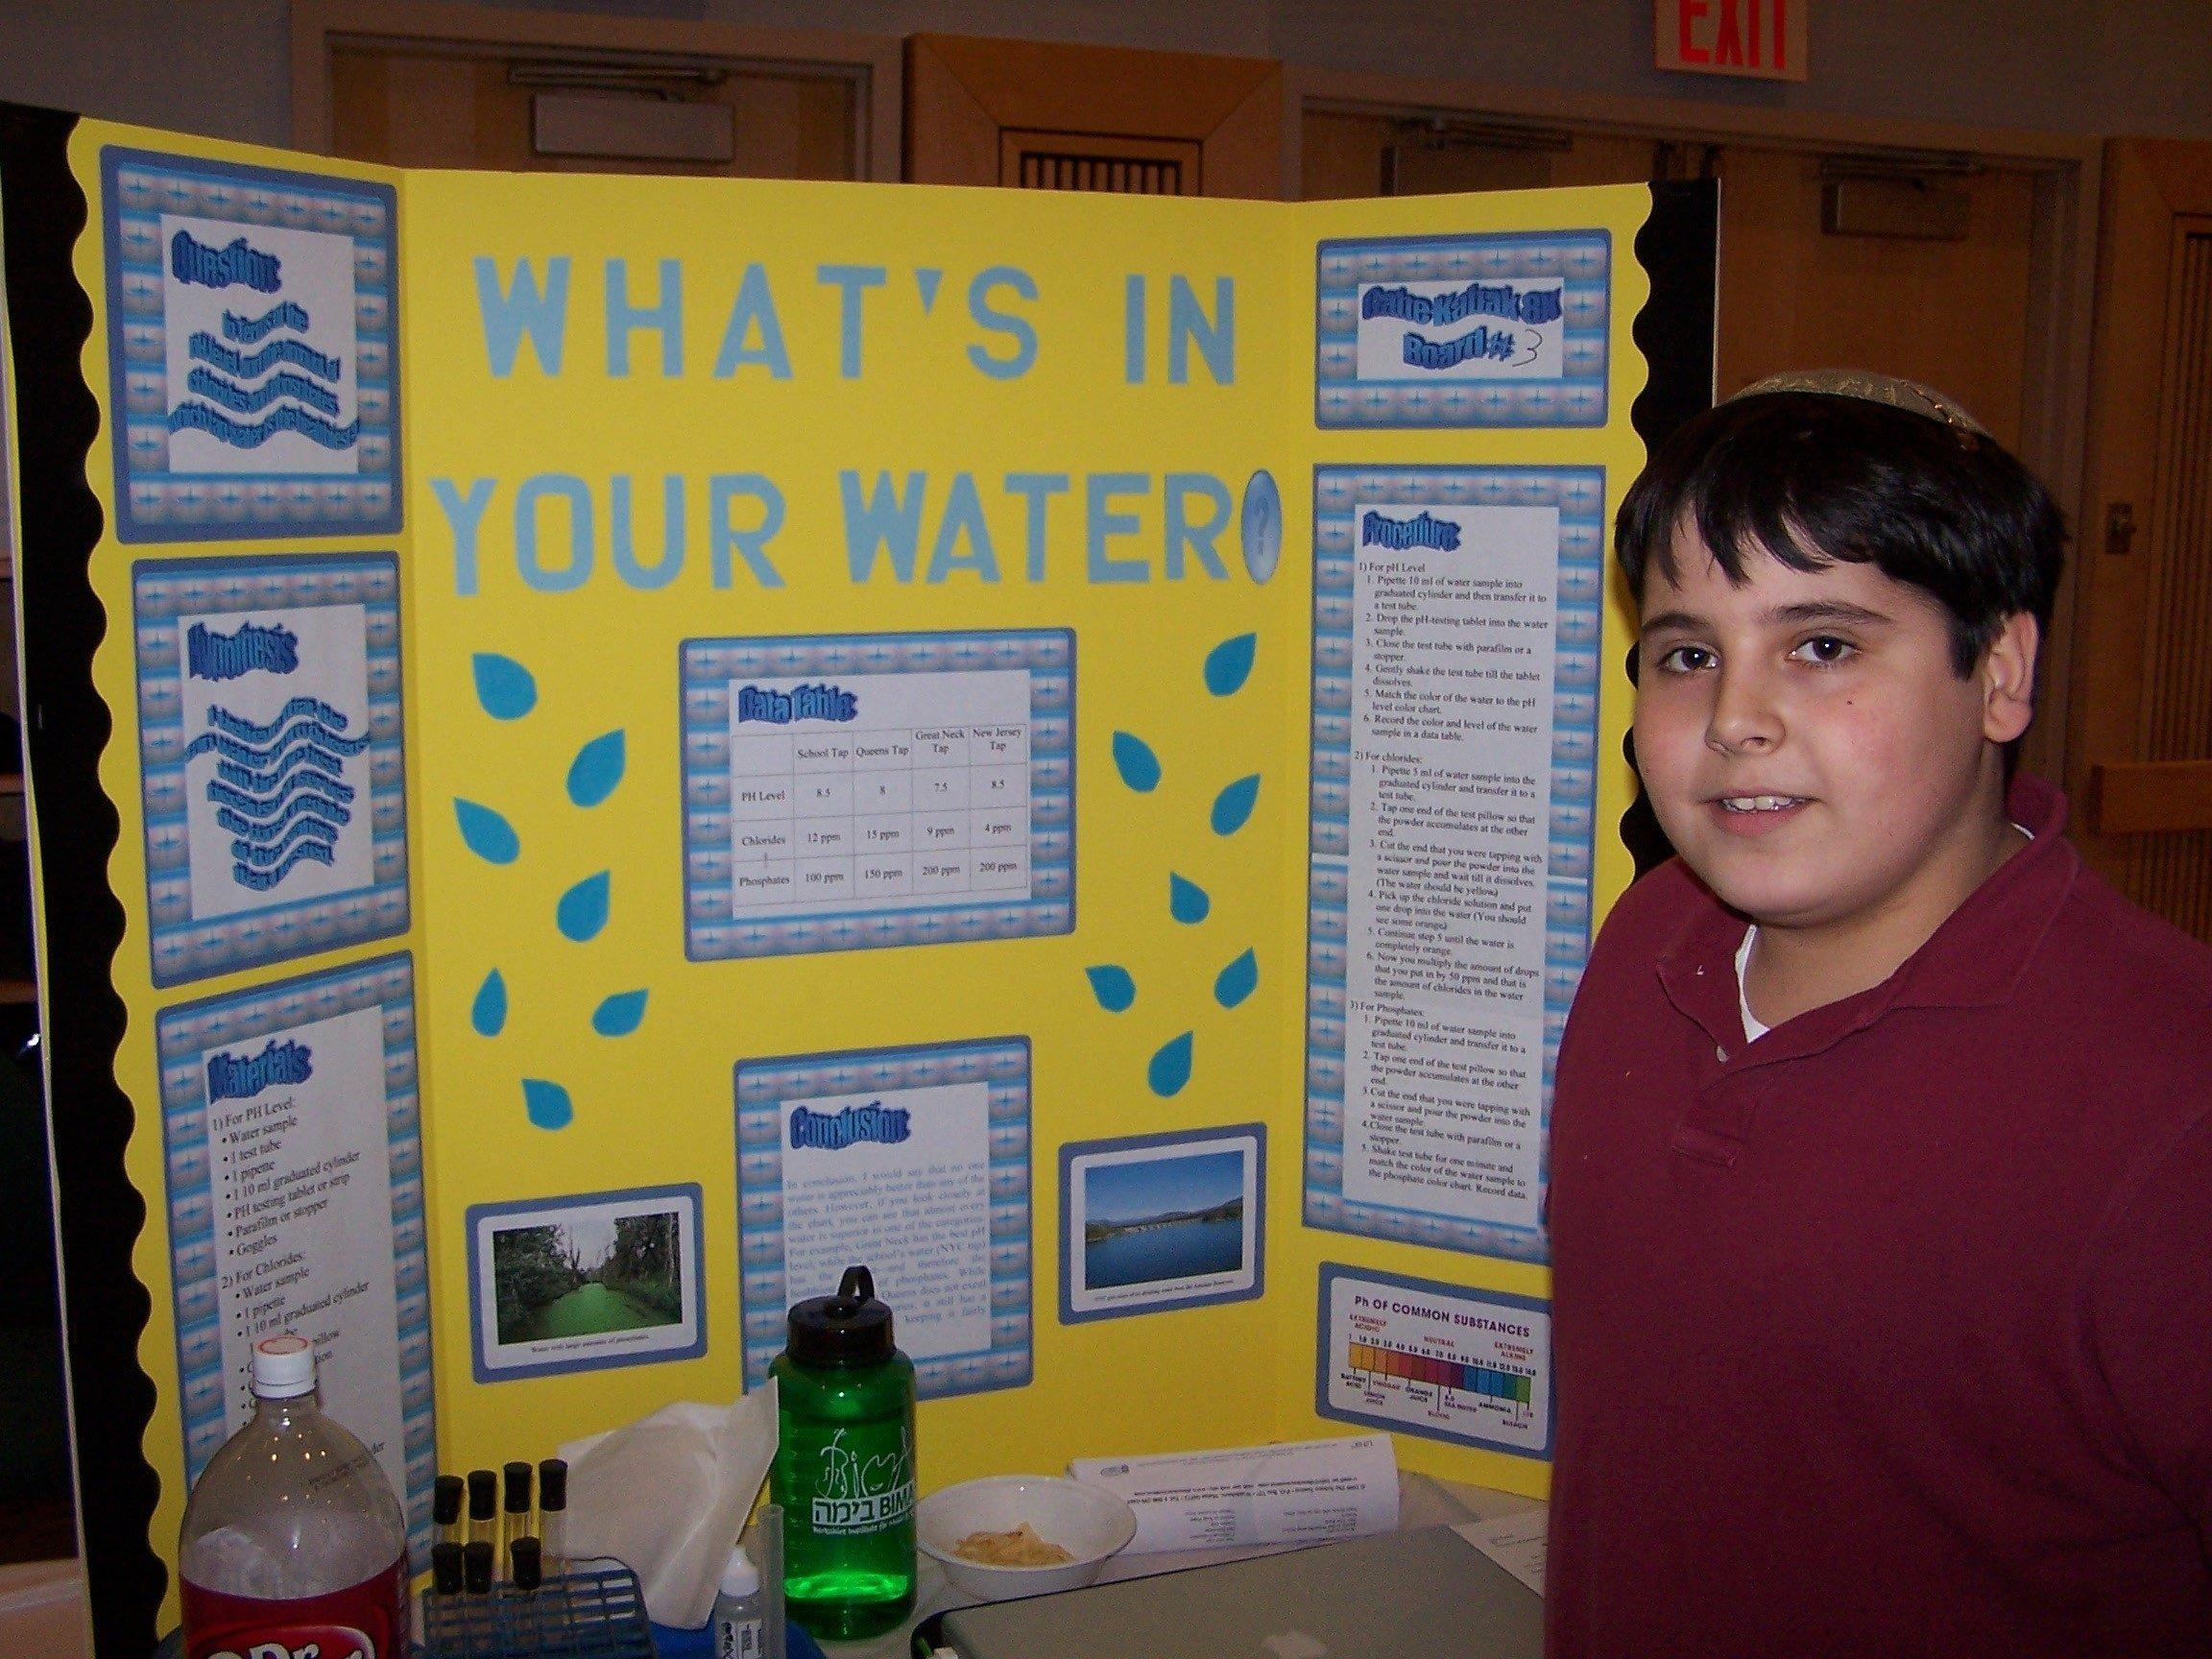 10 Best Science Fair Project Ideas List 8 th grade science projects 100 final addition fair project for huge 1 2020